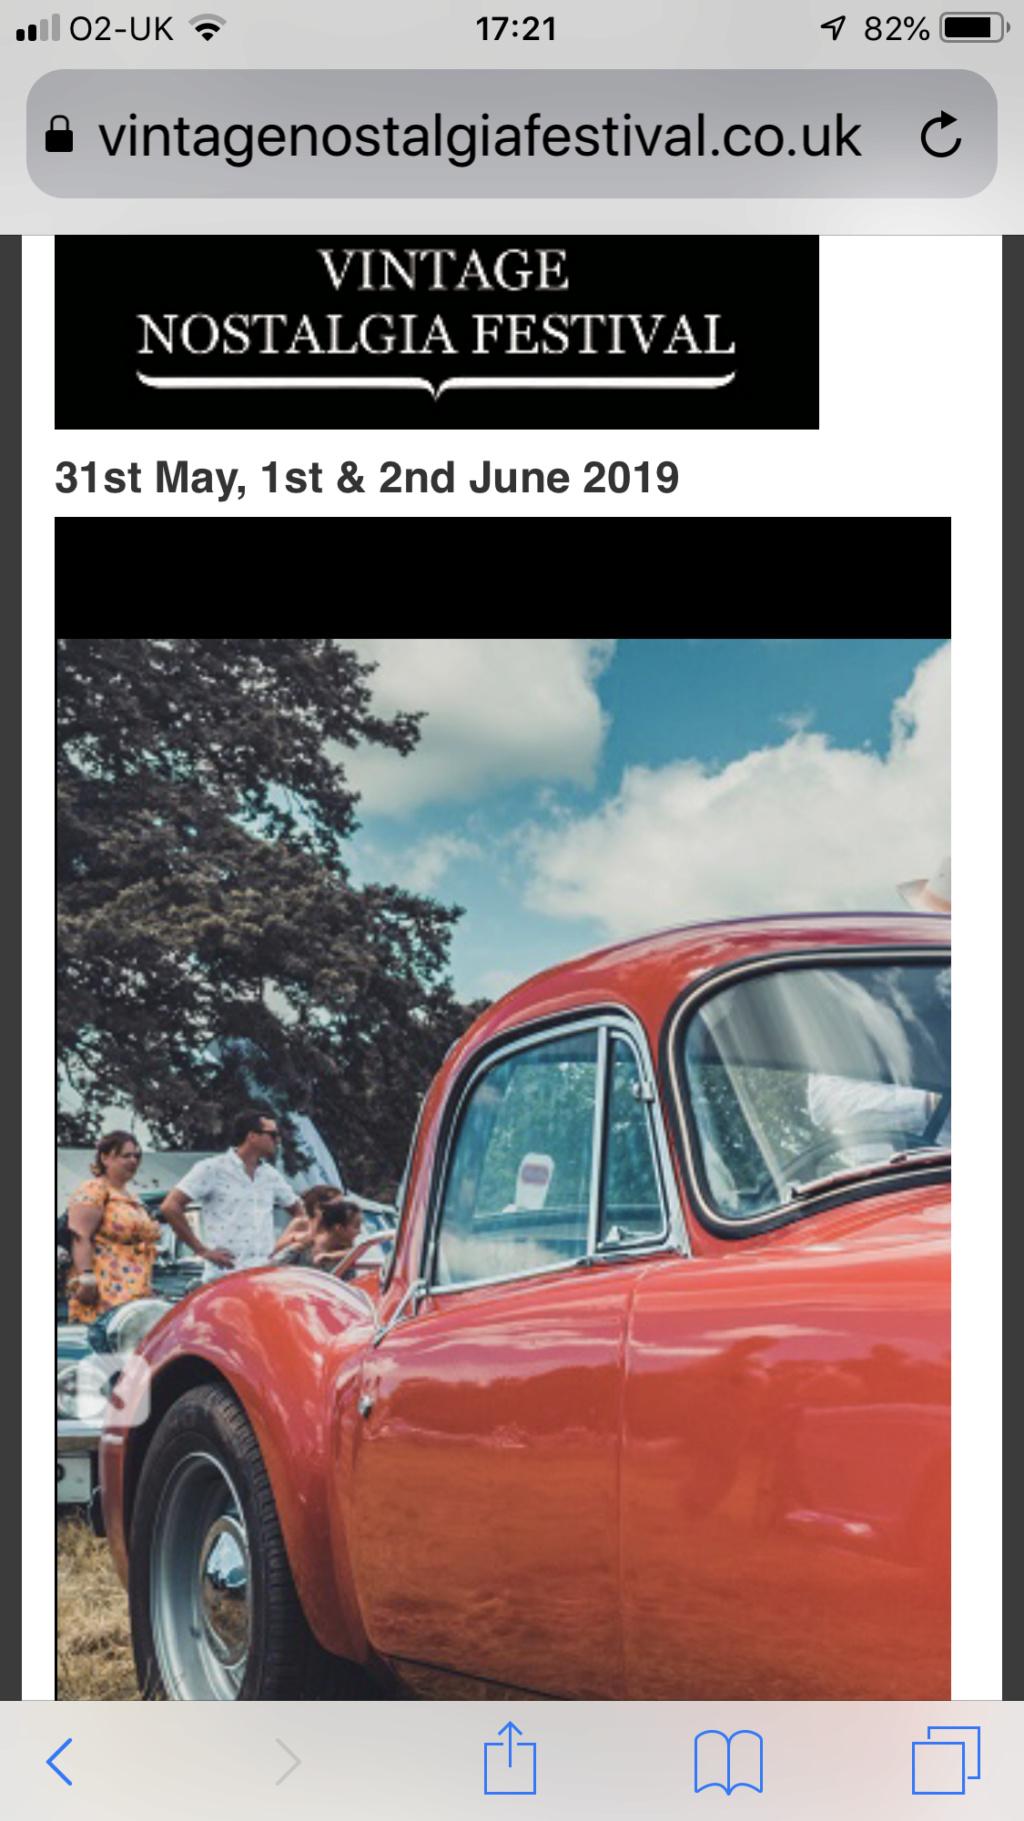 Vintage nostalgia festival. Near Salisbury ish. 31st May- 2nd June 2019 4f5b5510